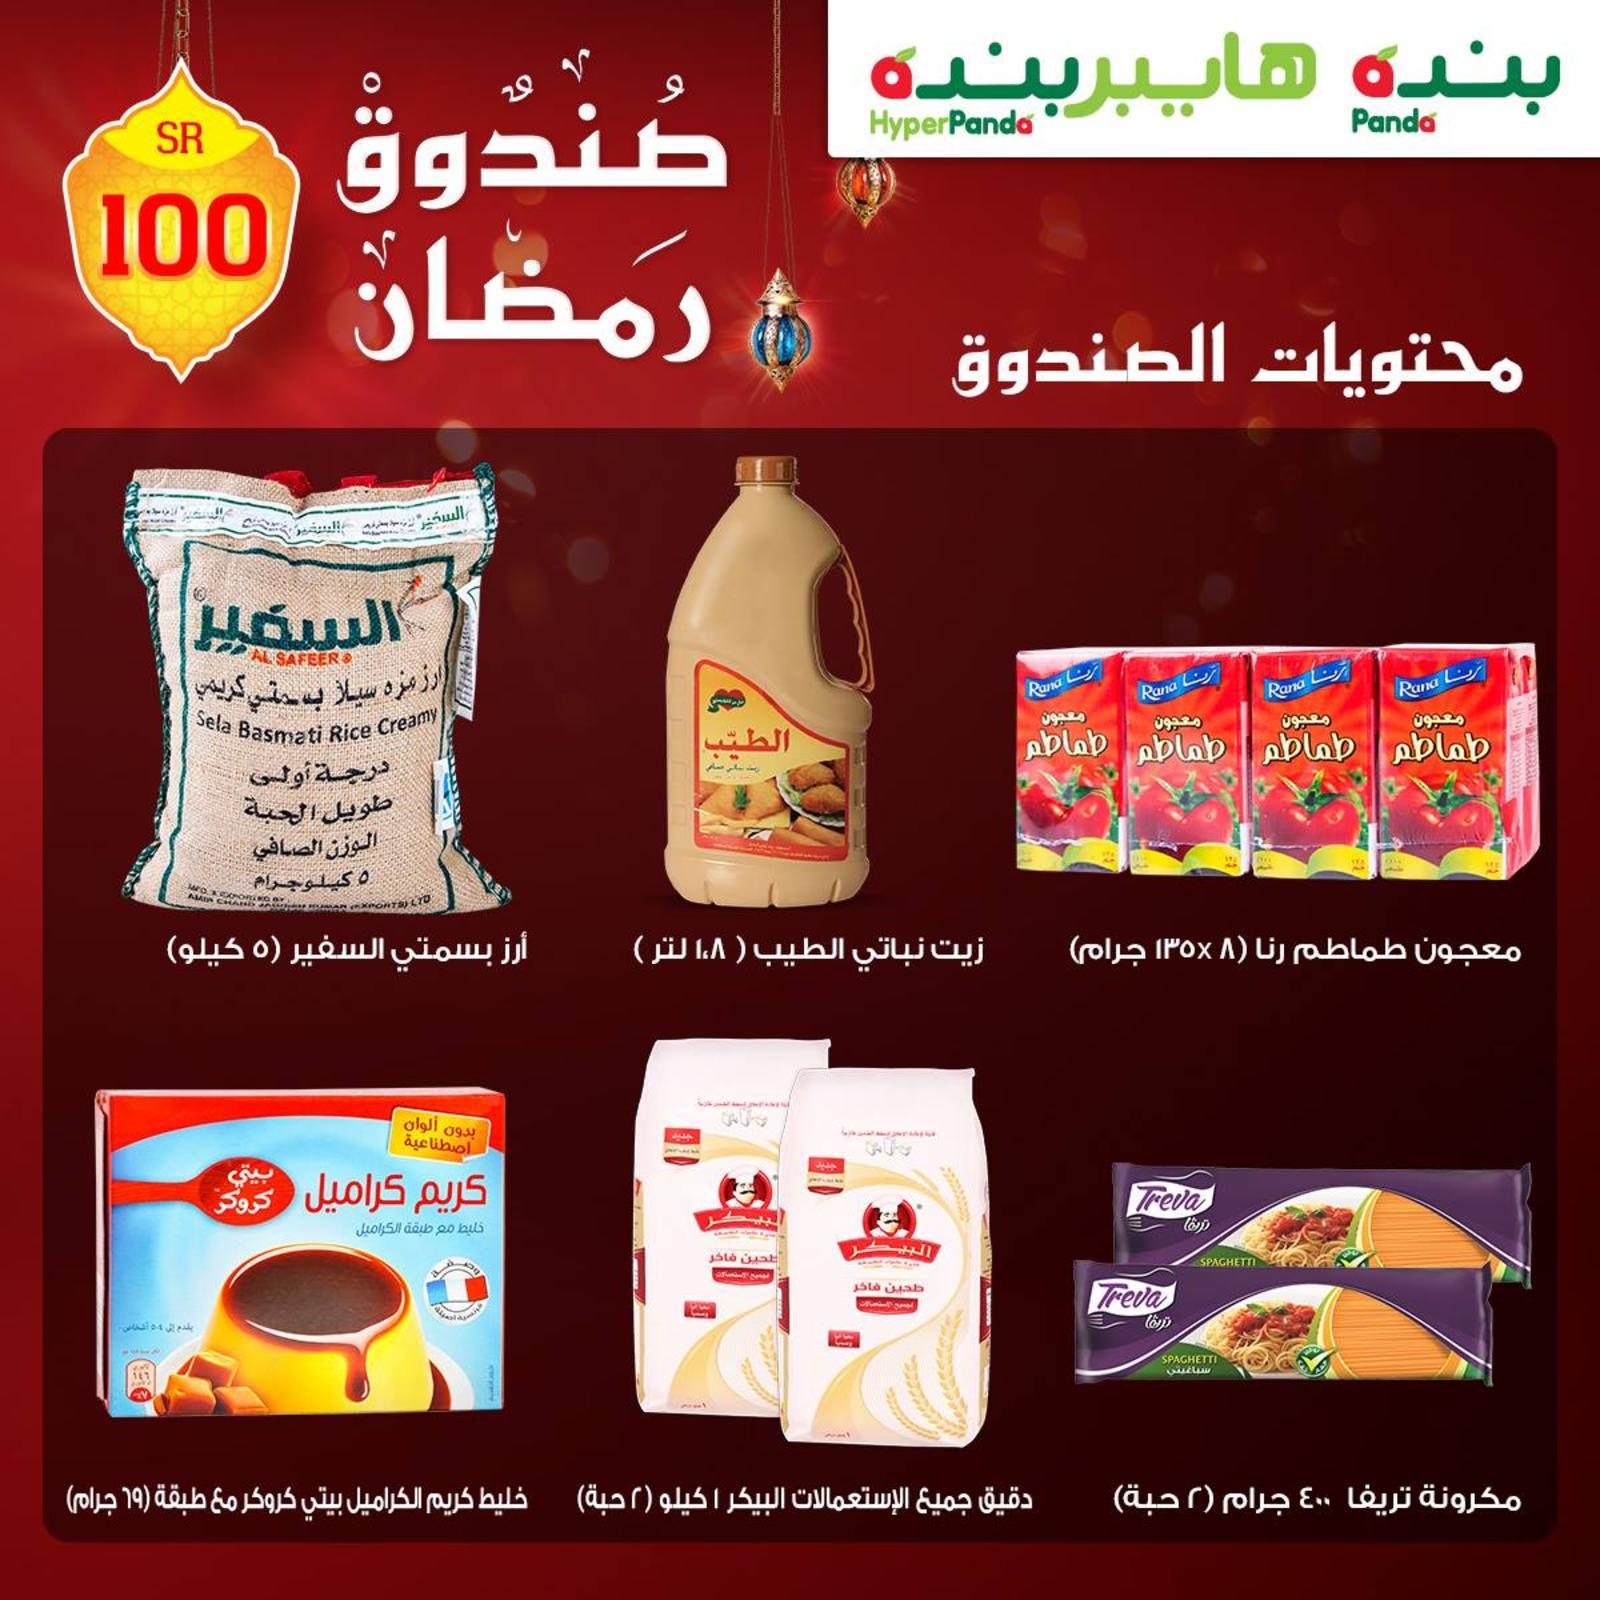 سلة رمضان لدى بنده وهايبر بنده السعودية من 24 4 2019 رمضان كريم تسوق نت